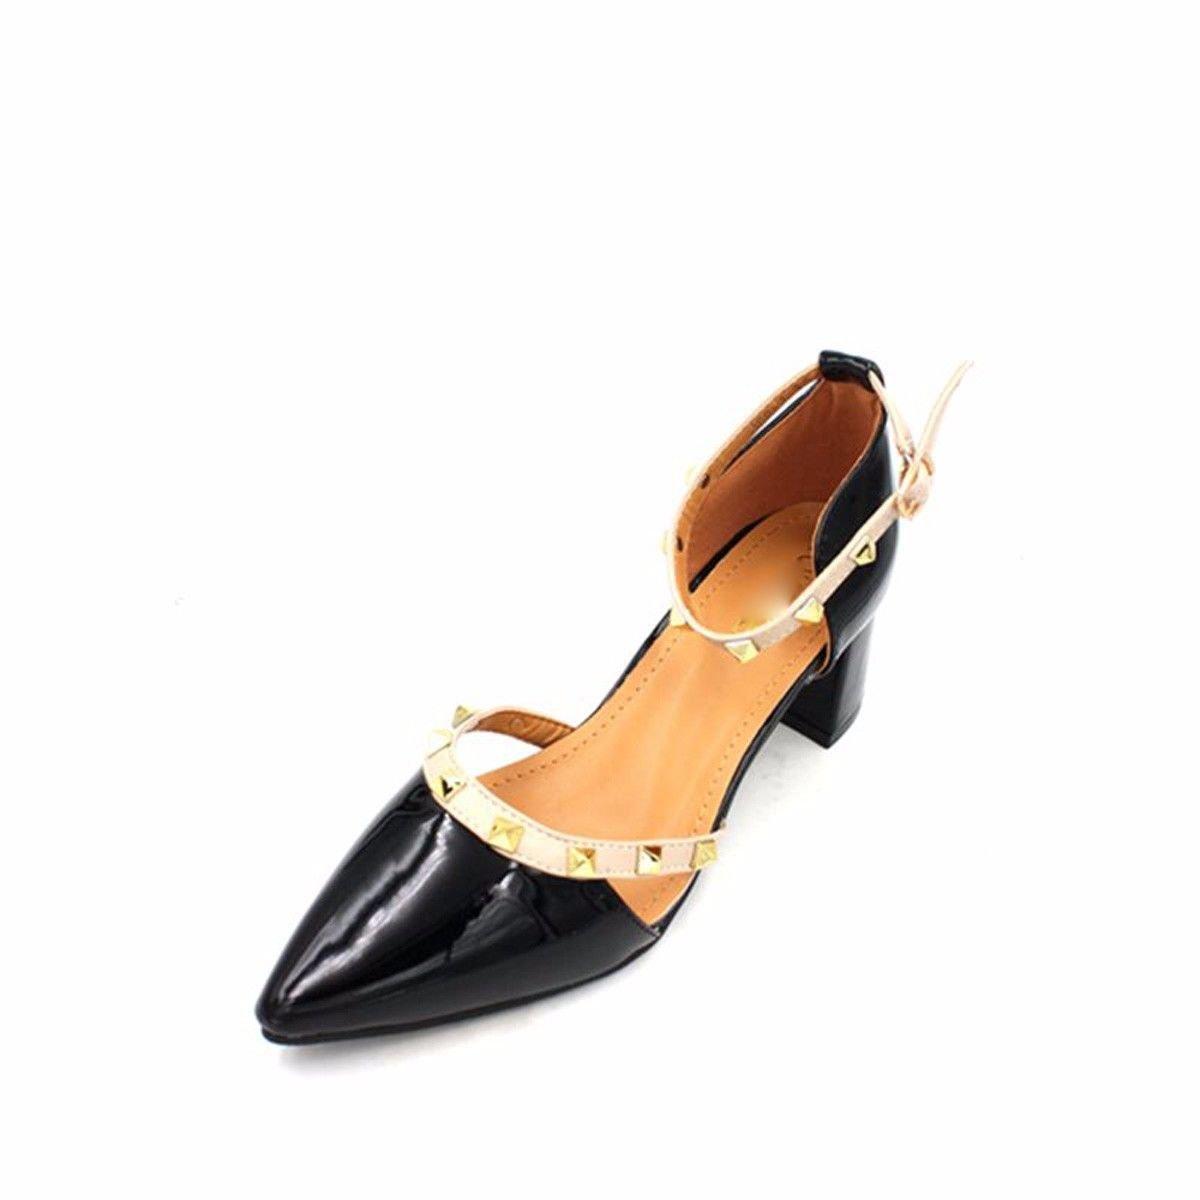 GTVERNH Frühling Flache Lack Hell Mittlere Ferse Schuhe Flache Frühling Spitze Hohl Damenschuhe. Apricot color 183a7c